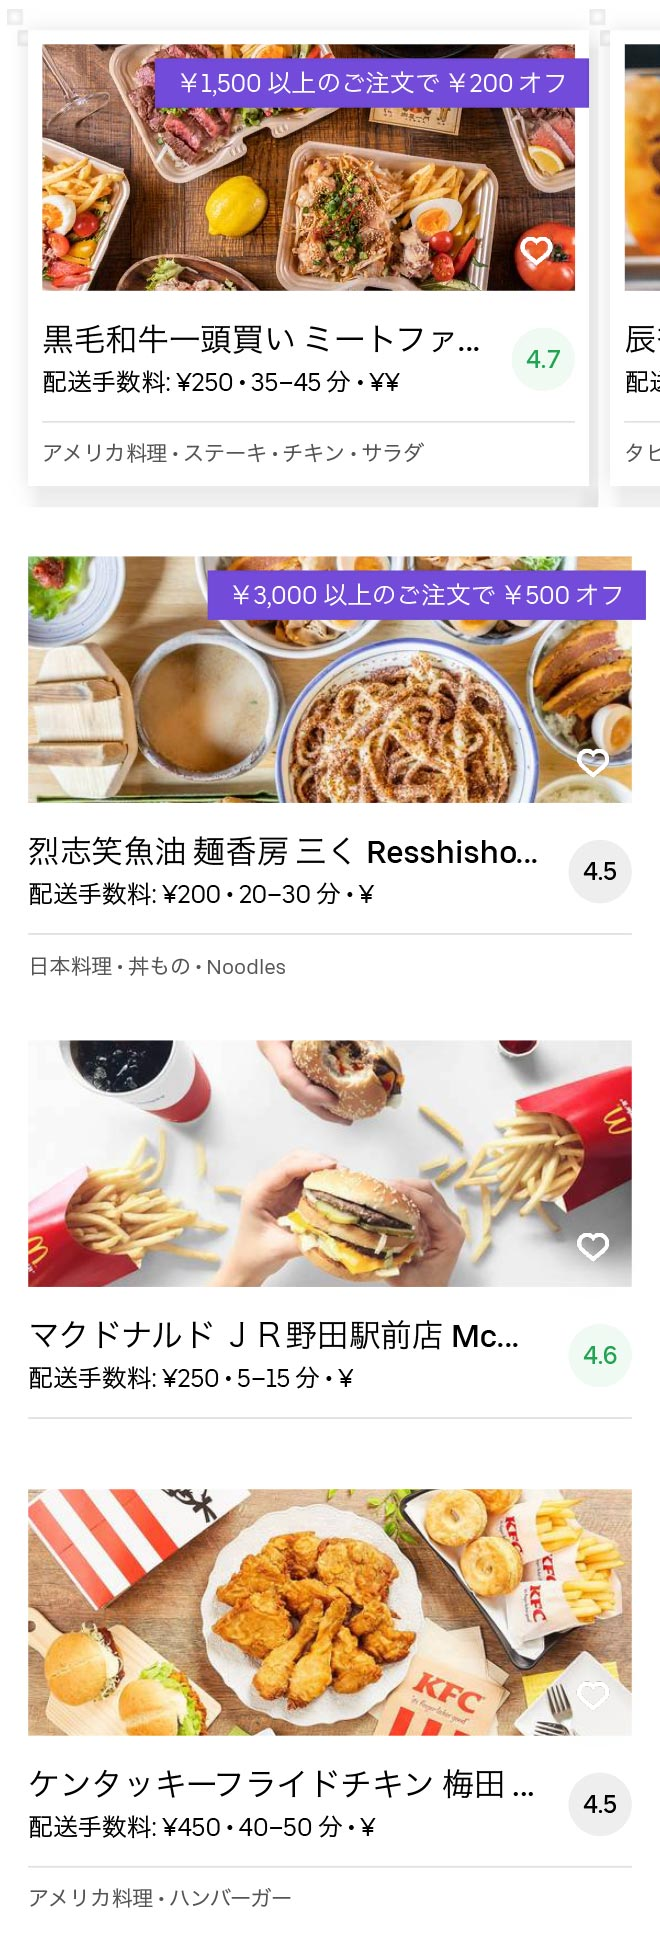 Osaka nishi kujo menu 2005 02